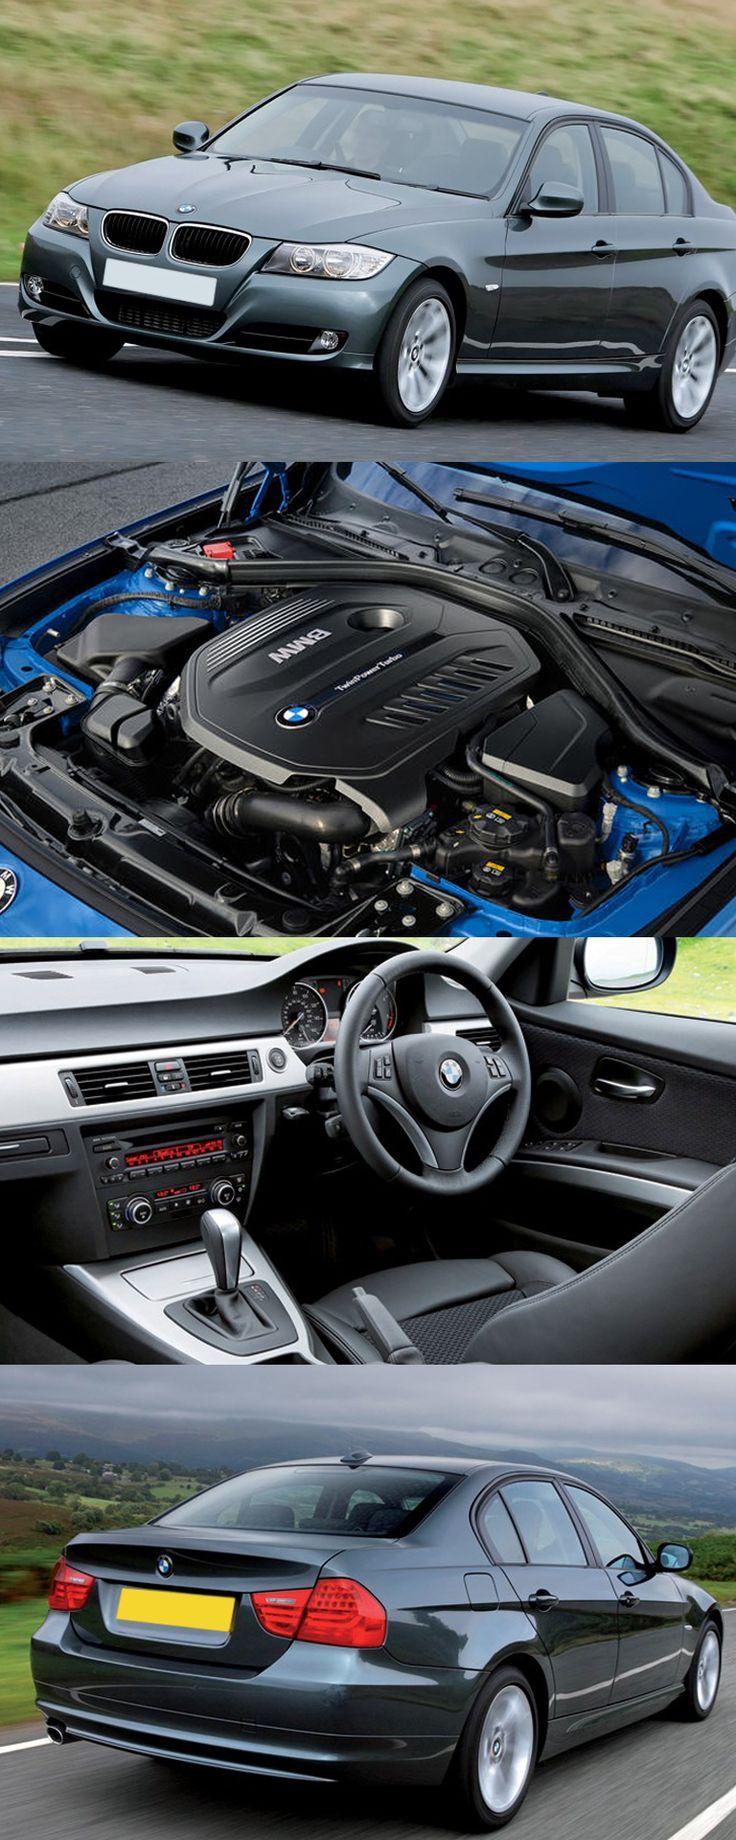 BMW 318d Shows Excellent Road Presence For more detail:https://www.germancartech.co.uk/blog/bmw-318d-shows-excellent-road-presence/